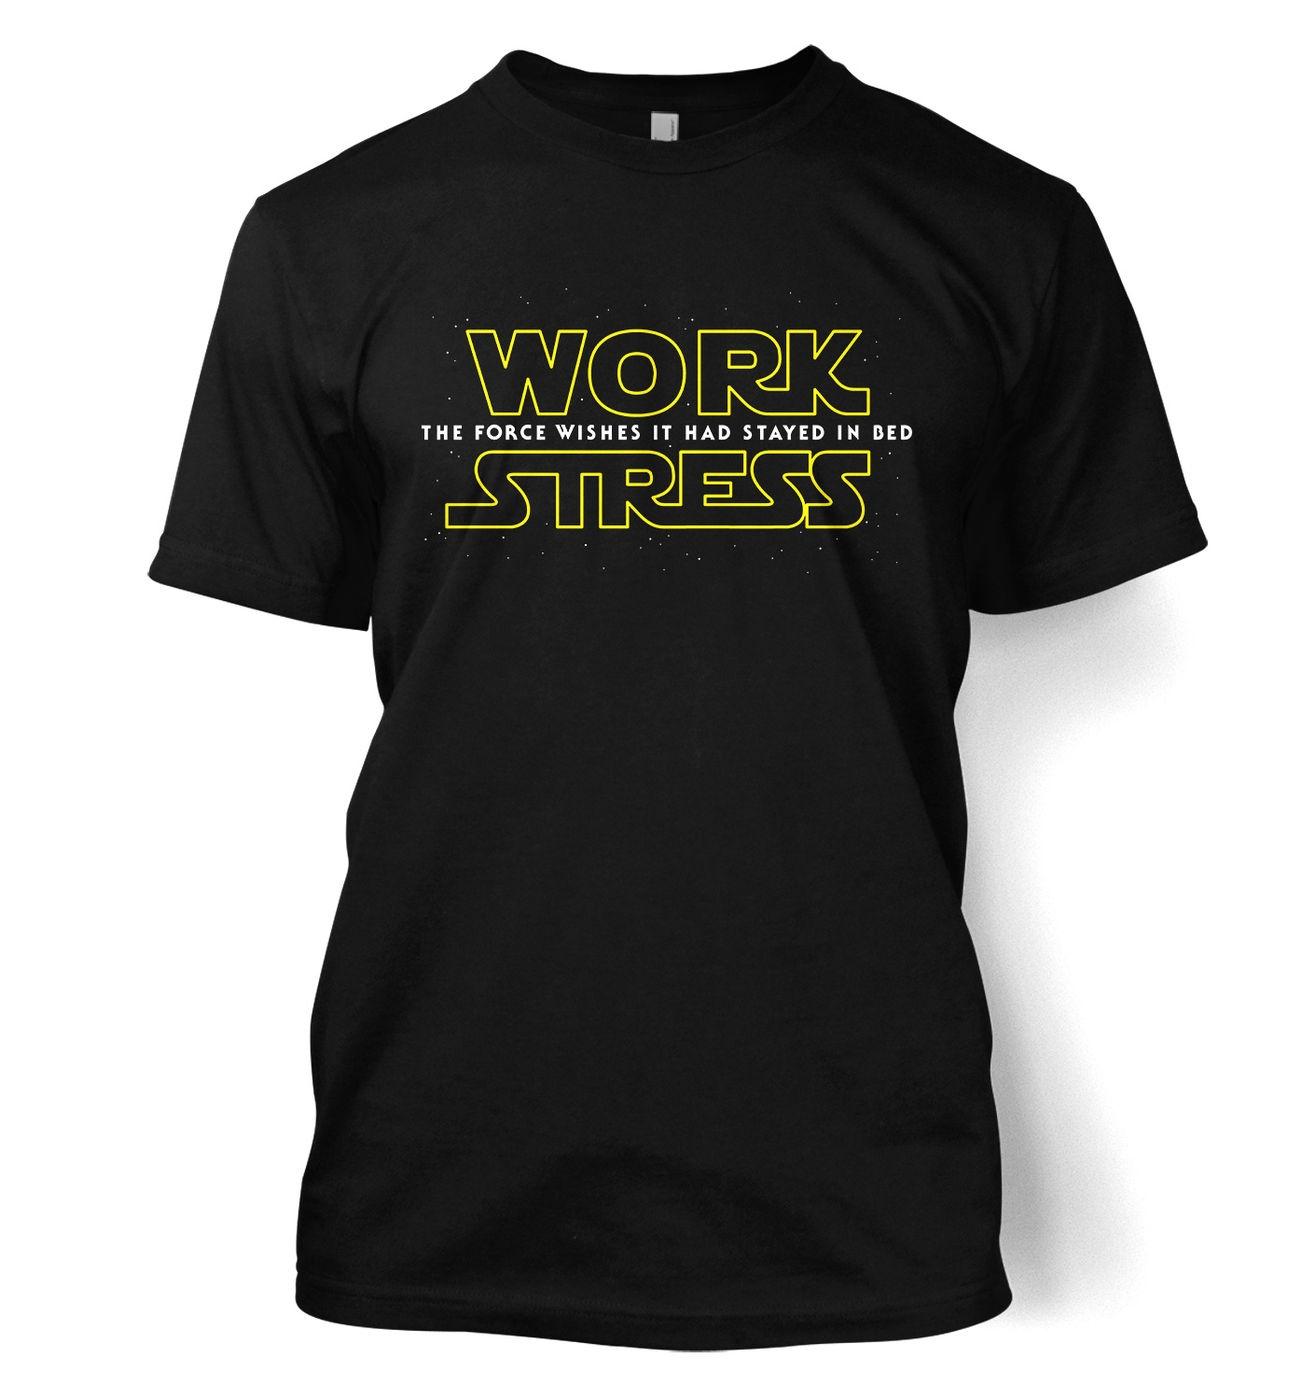 Work Stress t-shirt - funny Star Wars The Force Awakens parody tshirt